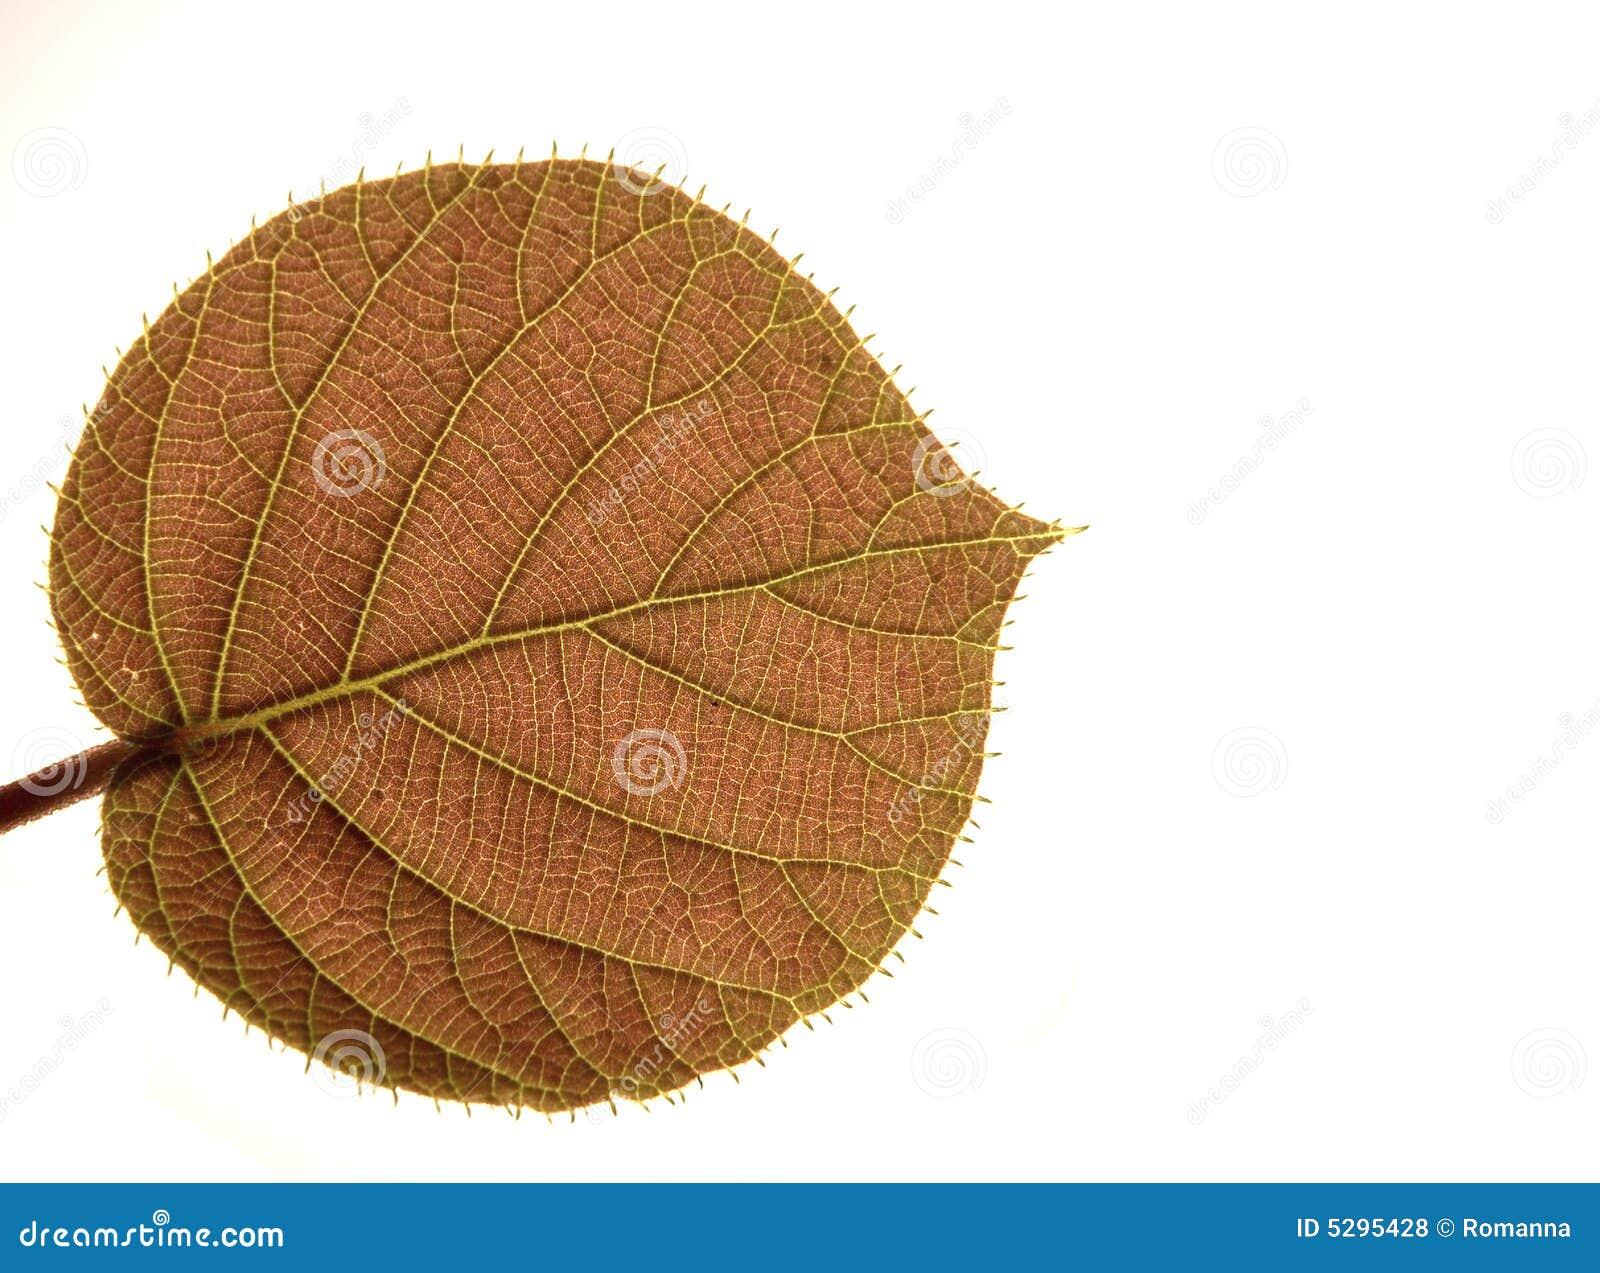 Transparent leaf of a kiwi